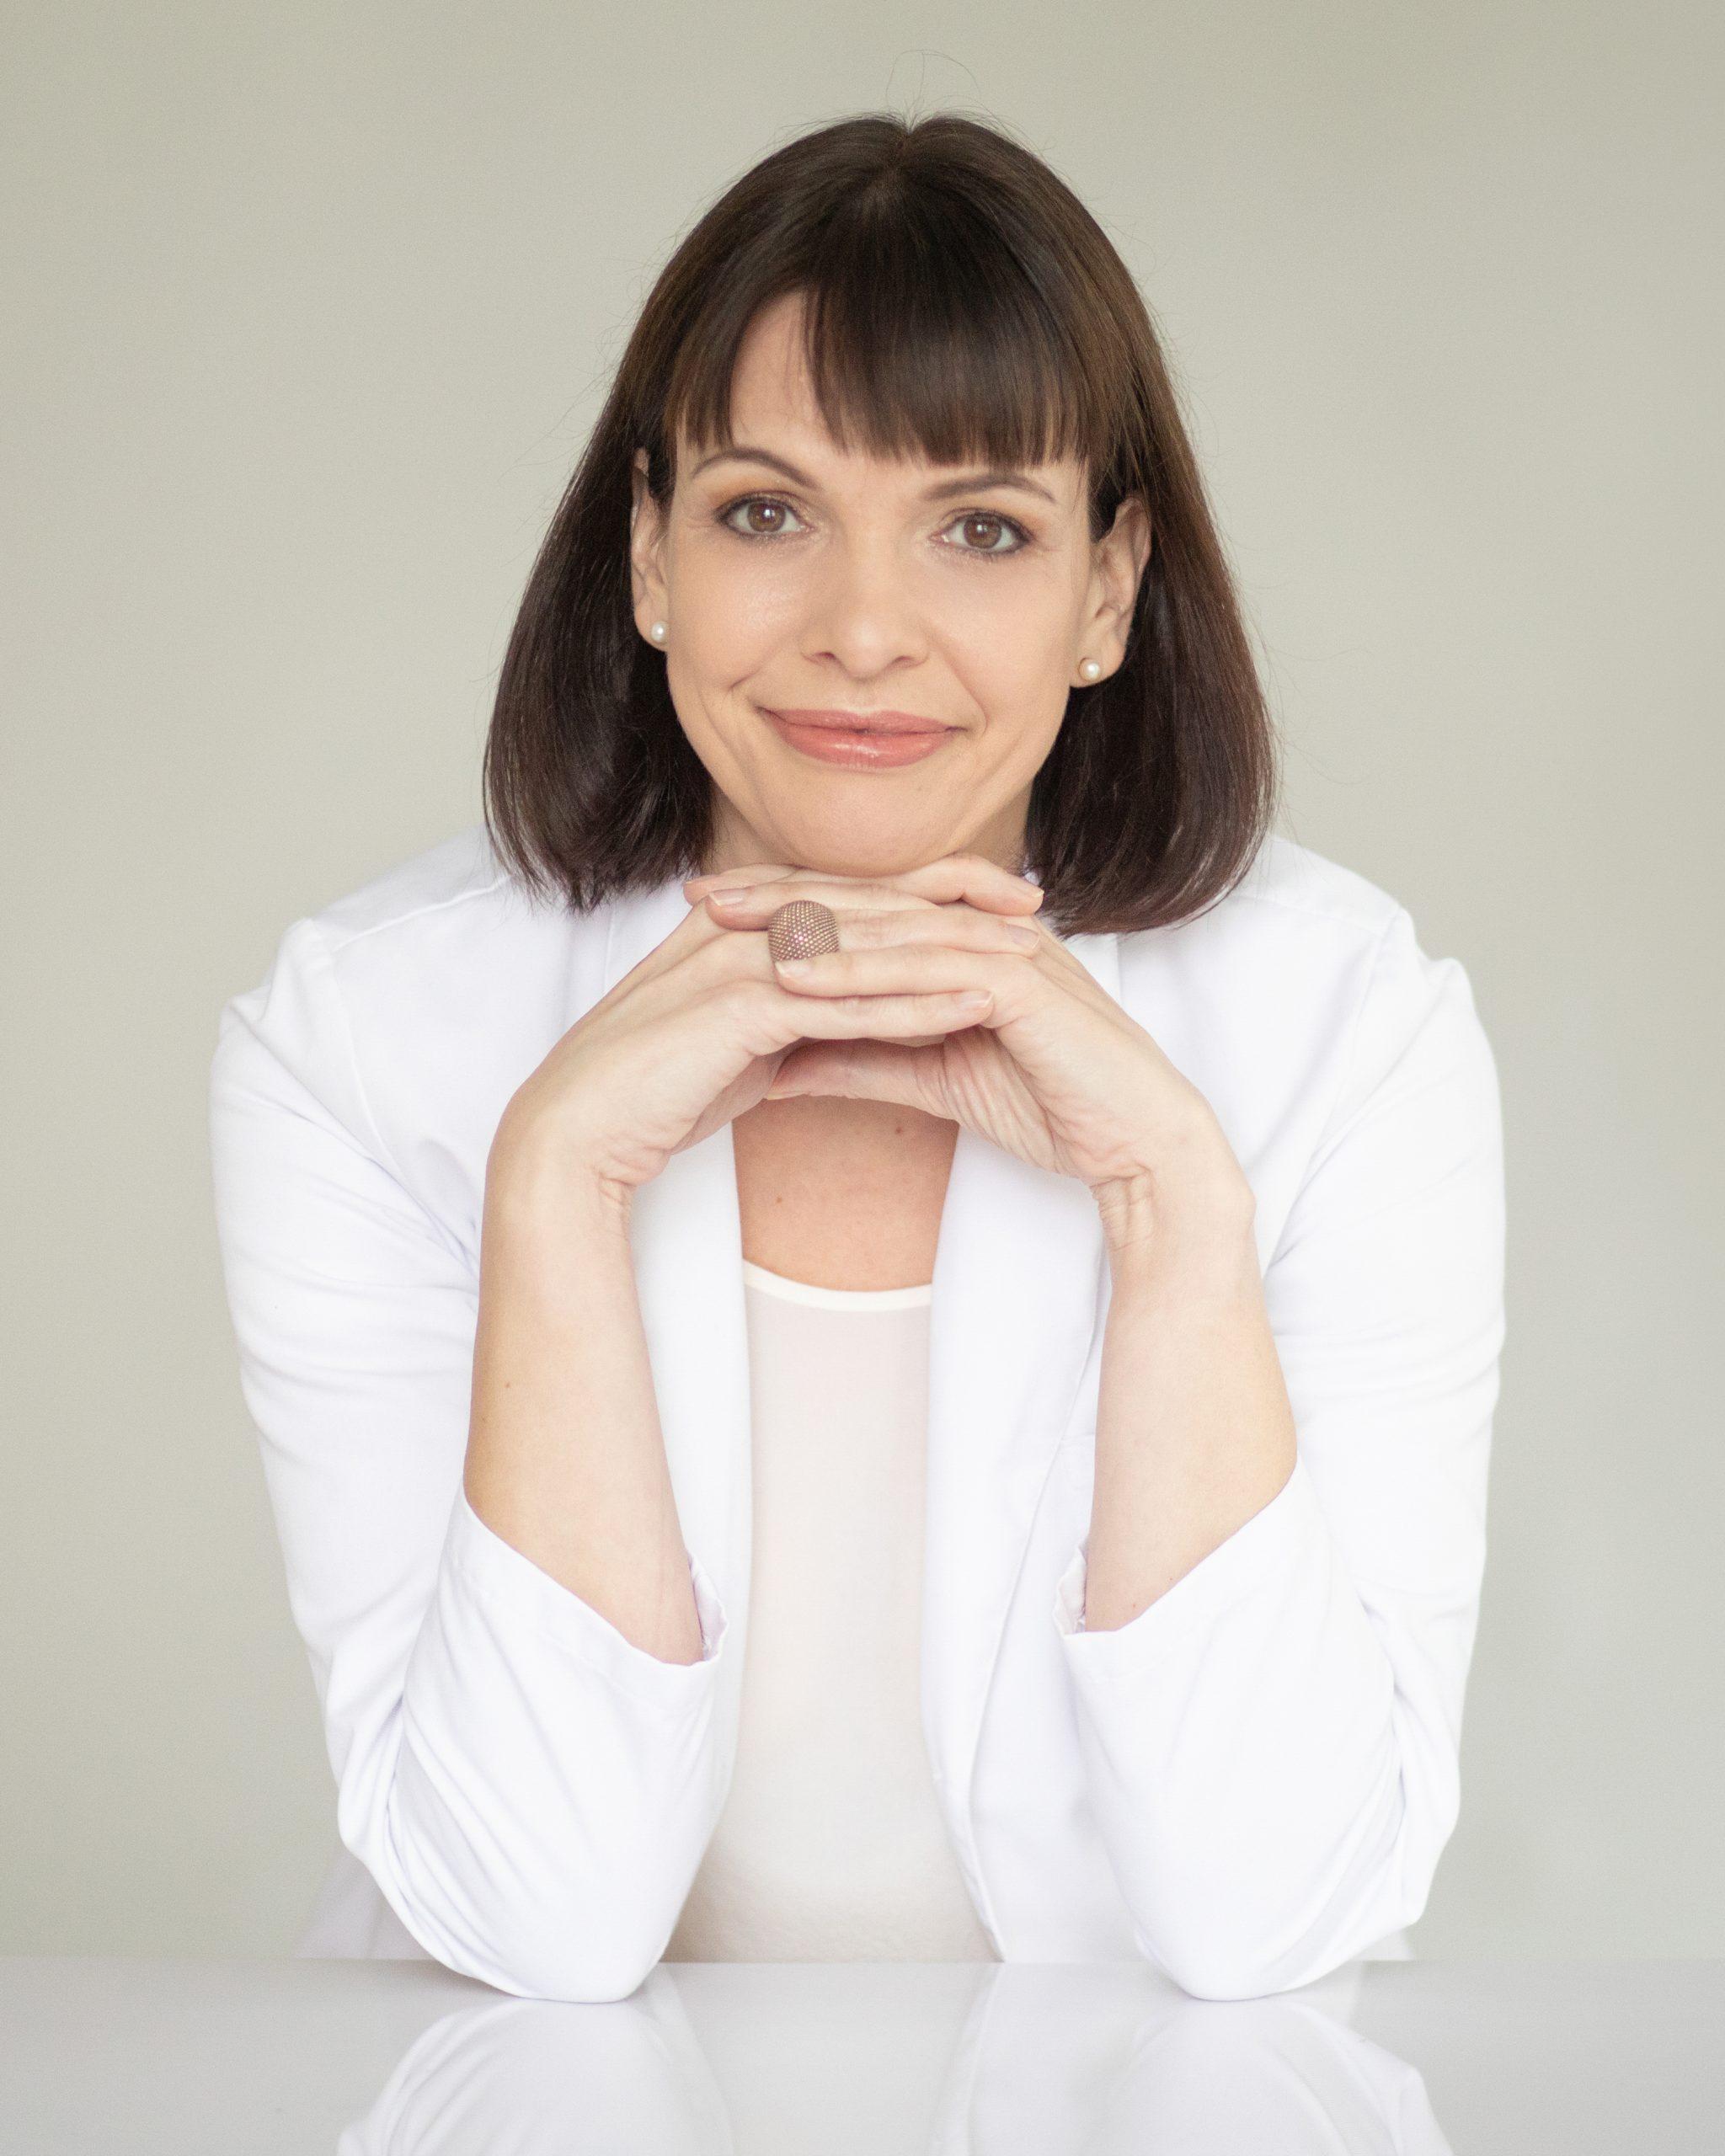 Dr. Sabine Eigner